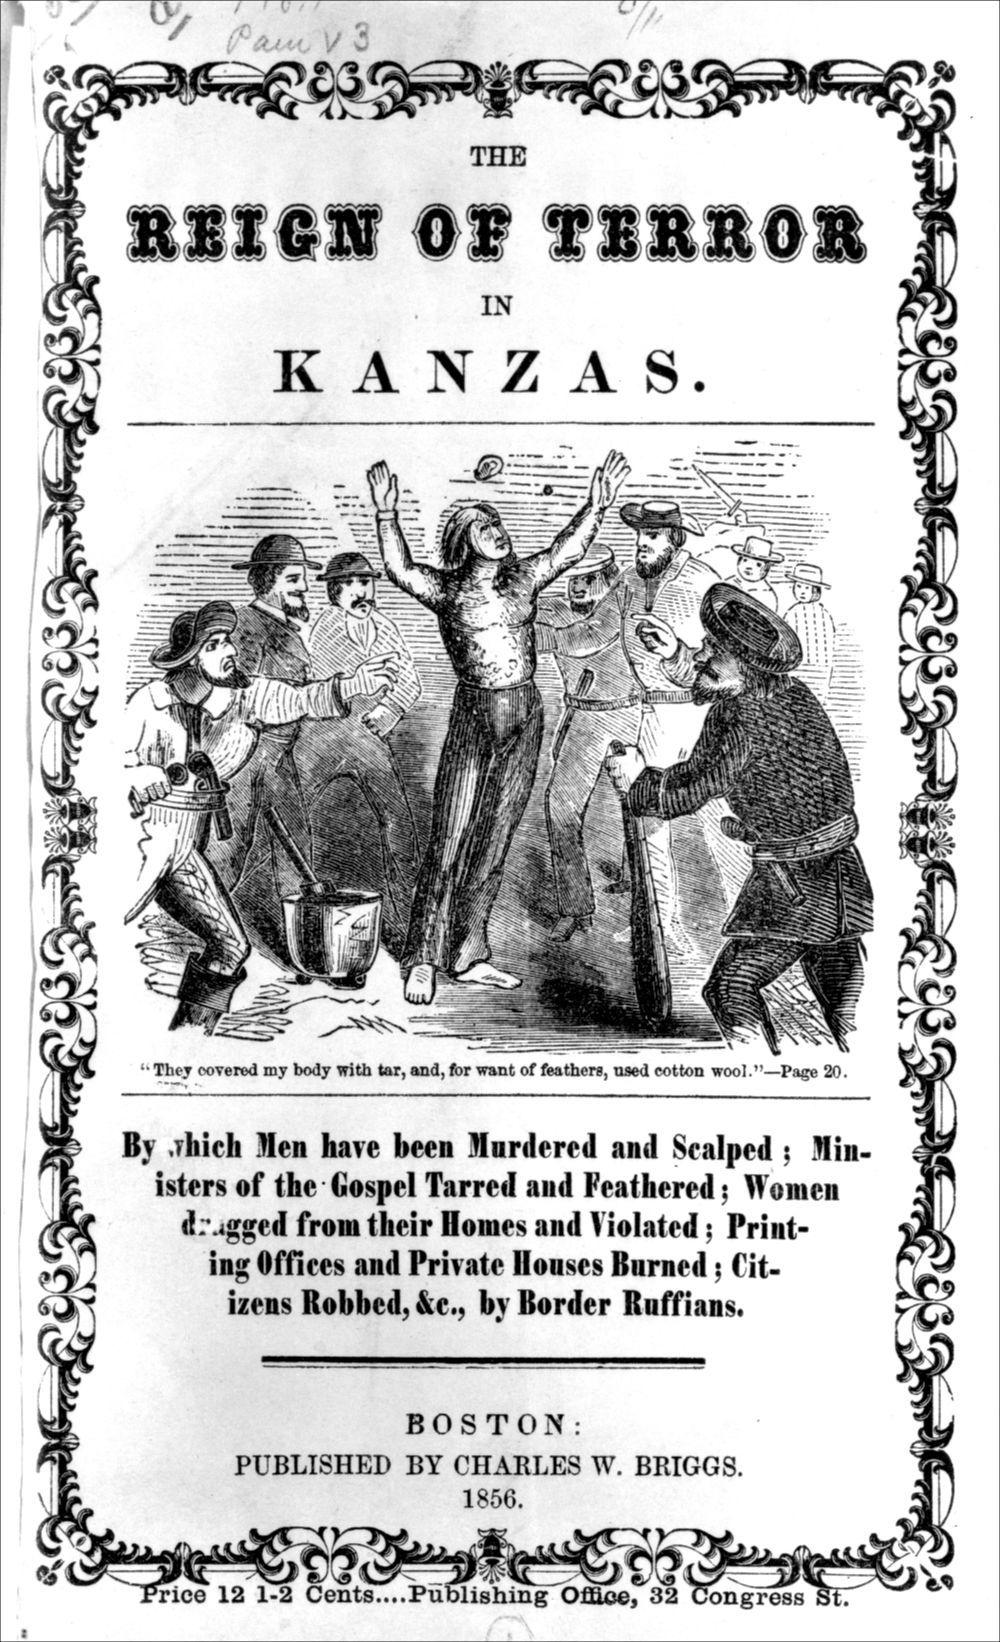 The reign of terror in Kanzas